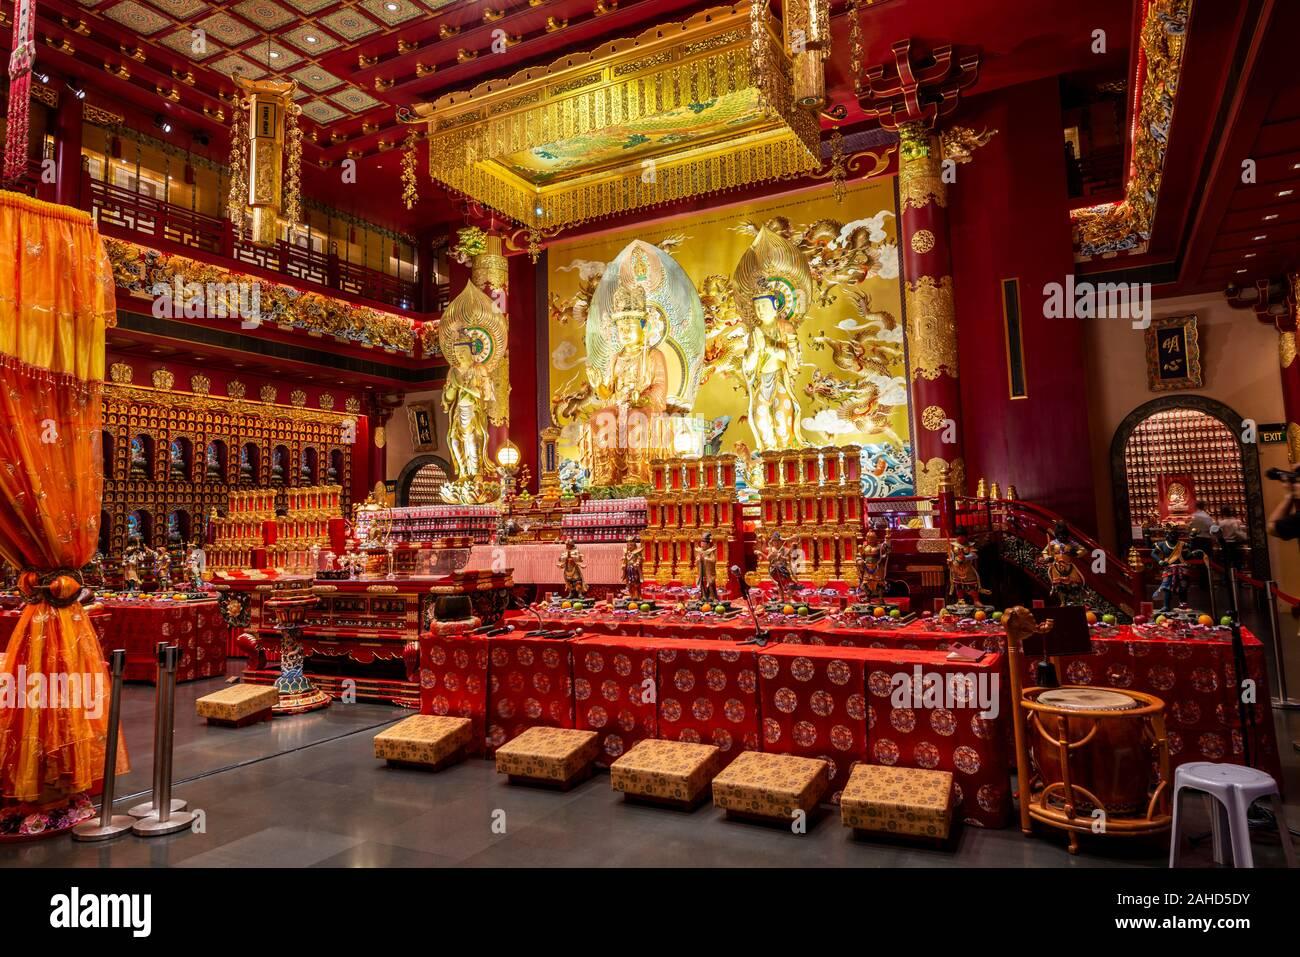 Interior view, Buddha Tooth Relic Temple, Chinatown, Singapore Stock Photo